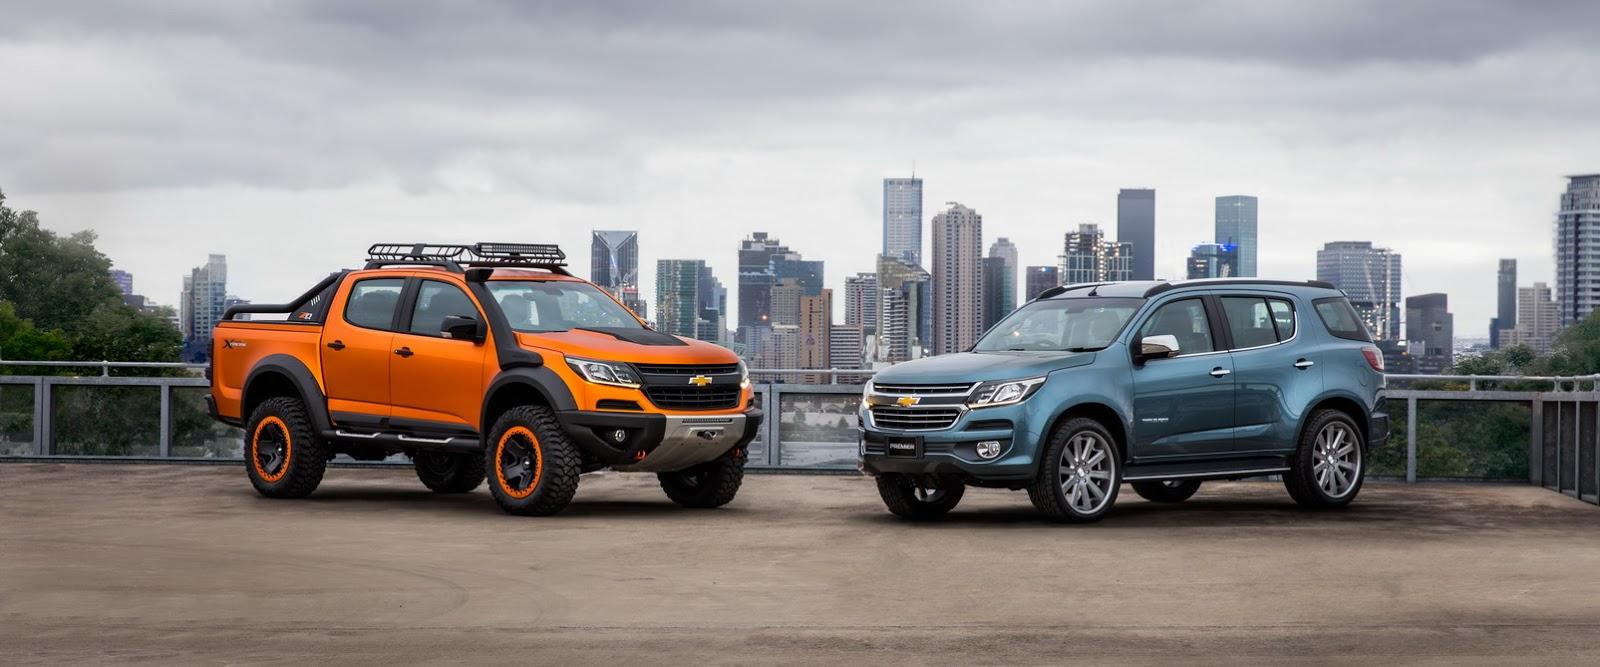 Chevrolet Teases 2017 Trailblazer Facelift With Premier Study